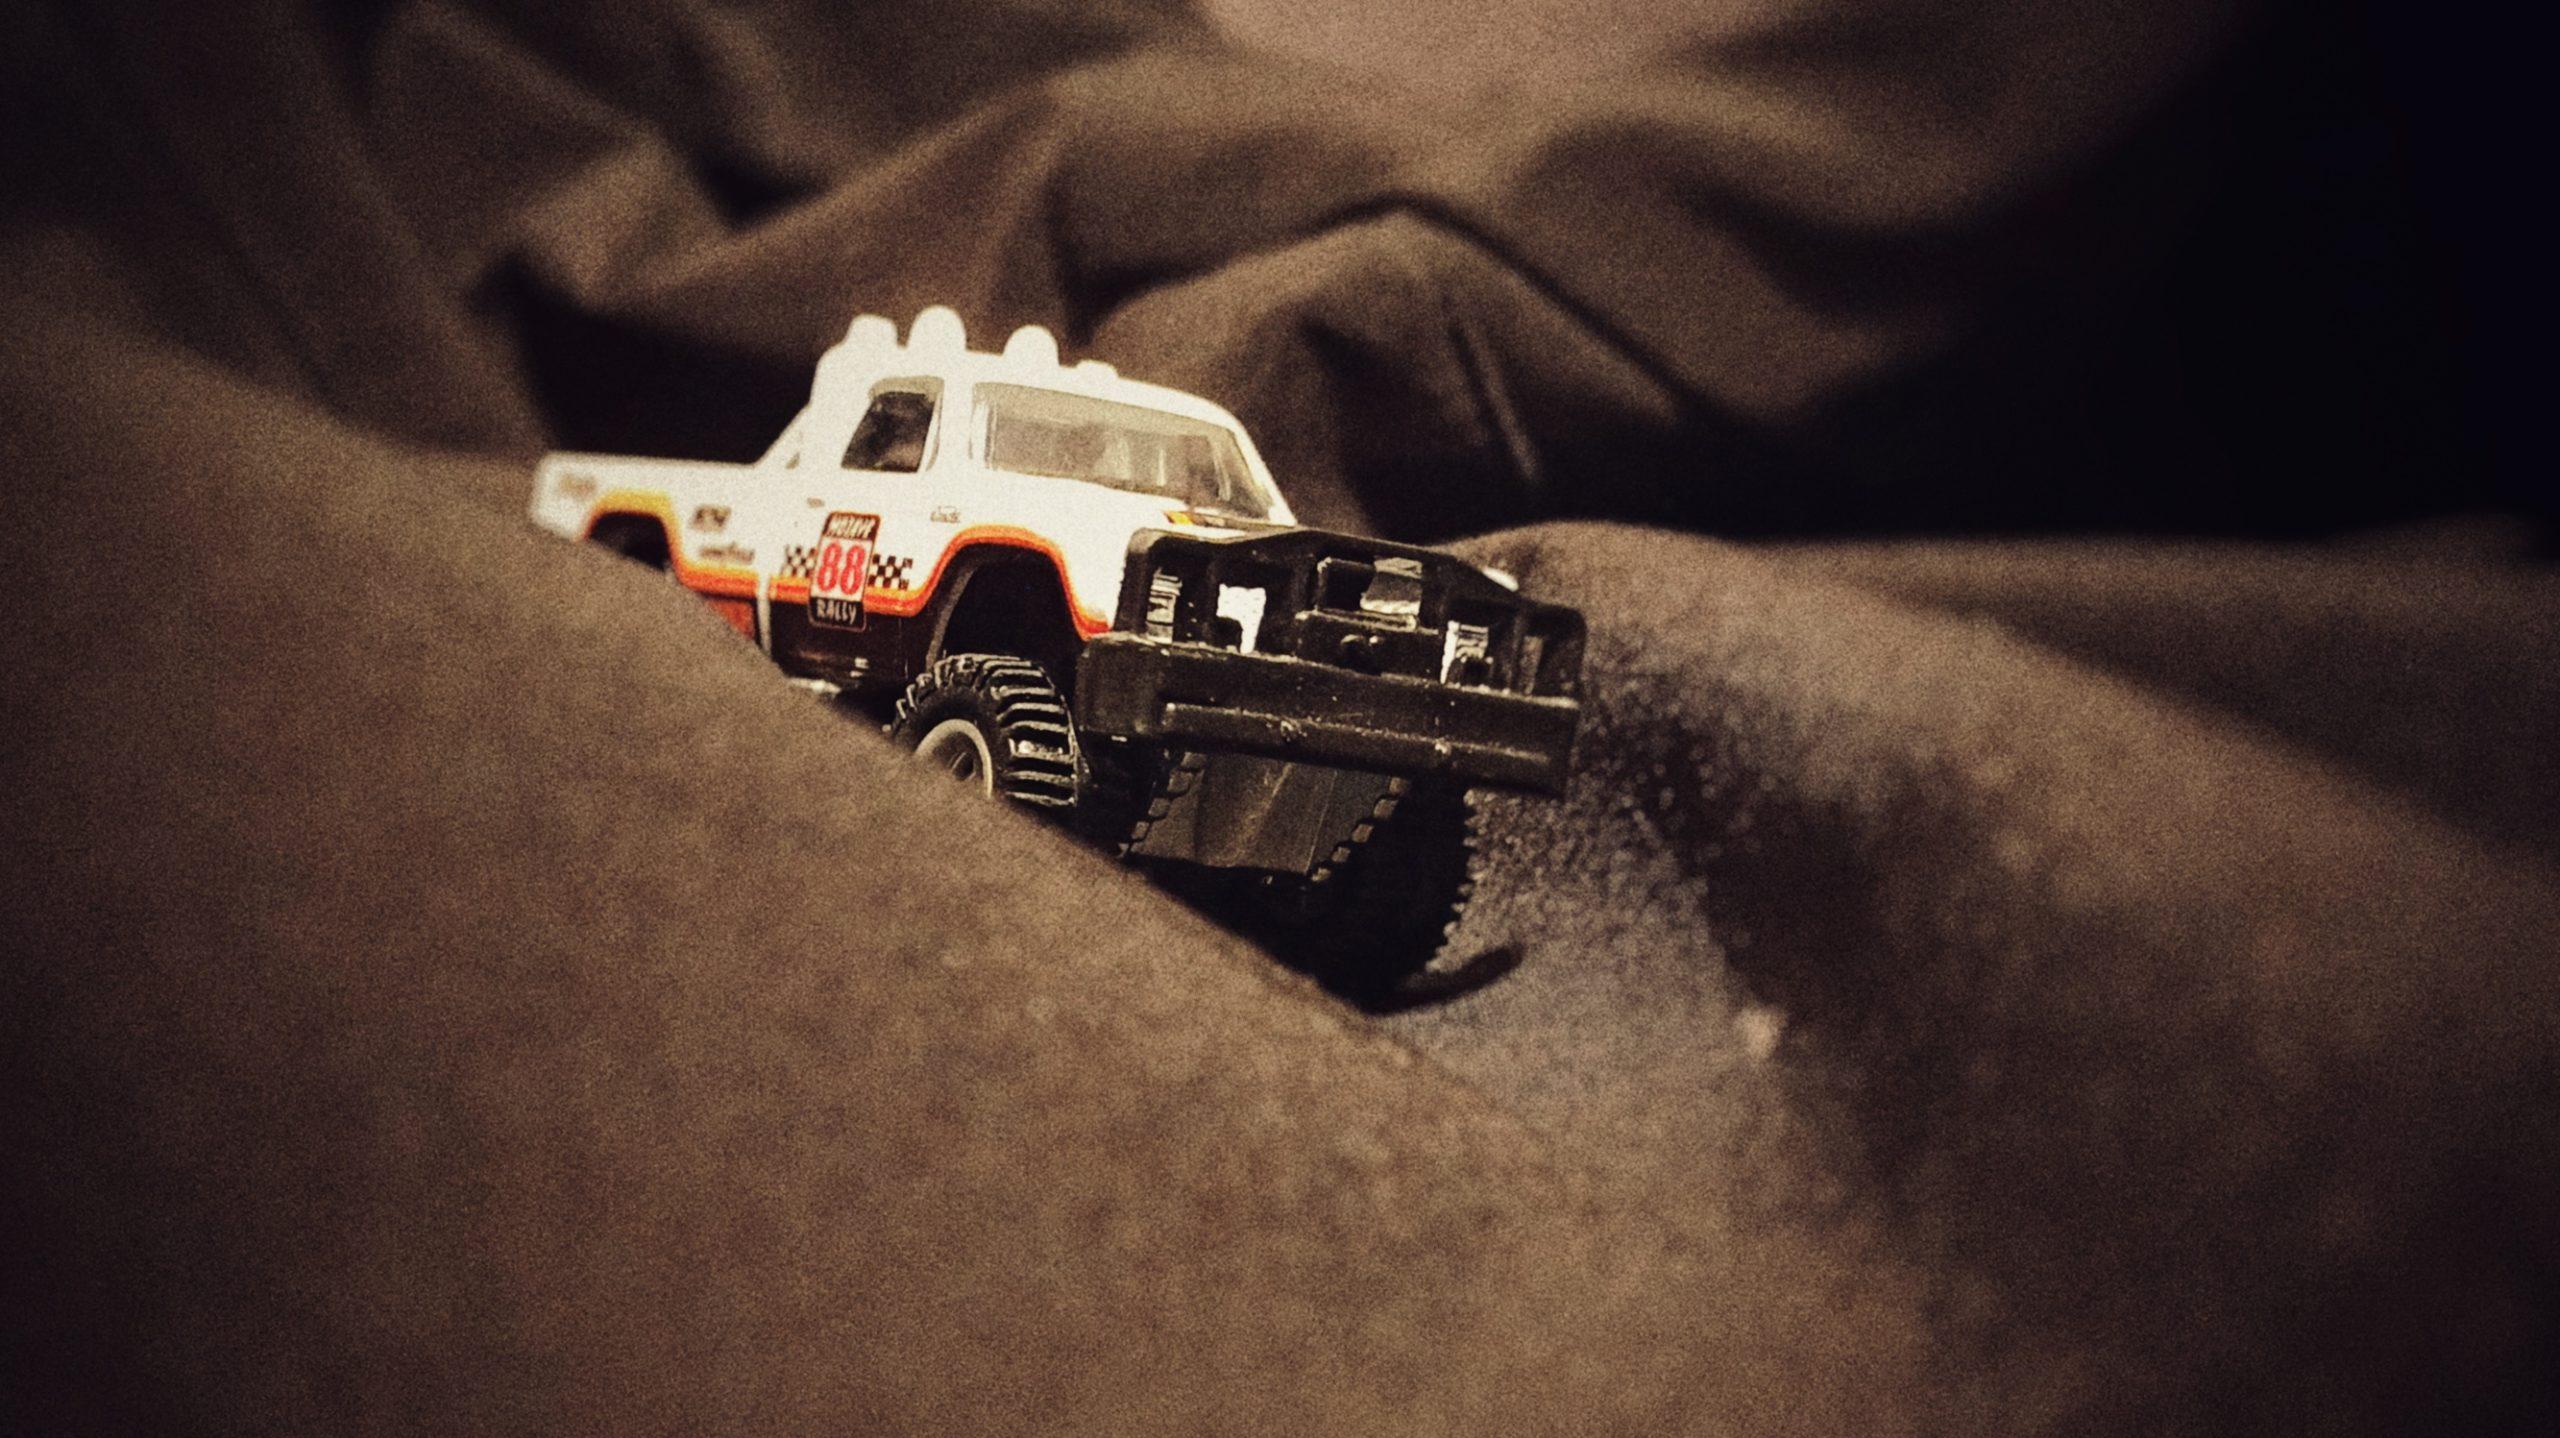 Hot Wheels 1980 Dodge Macho Power Wagon (FYN73) 2019 Car Culture: Desert Rally (2/5) white side angle